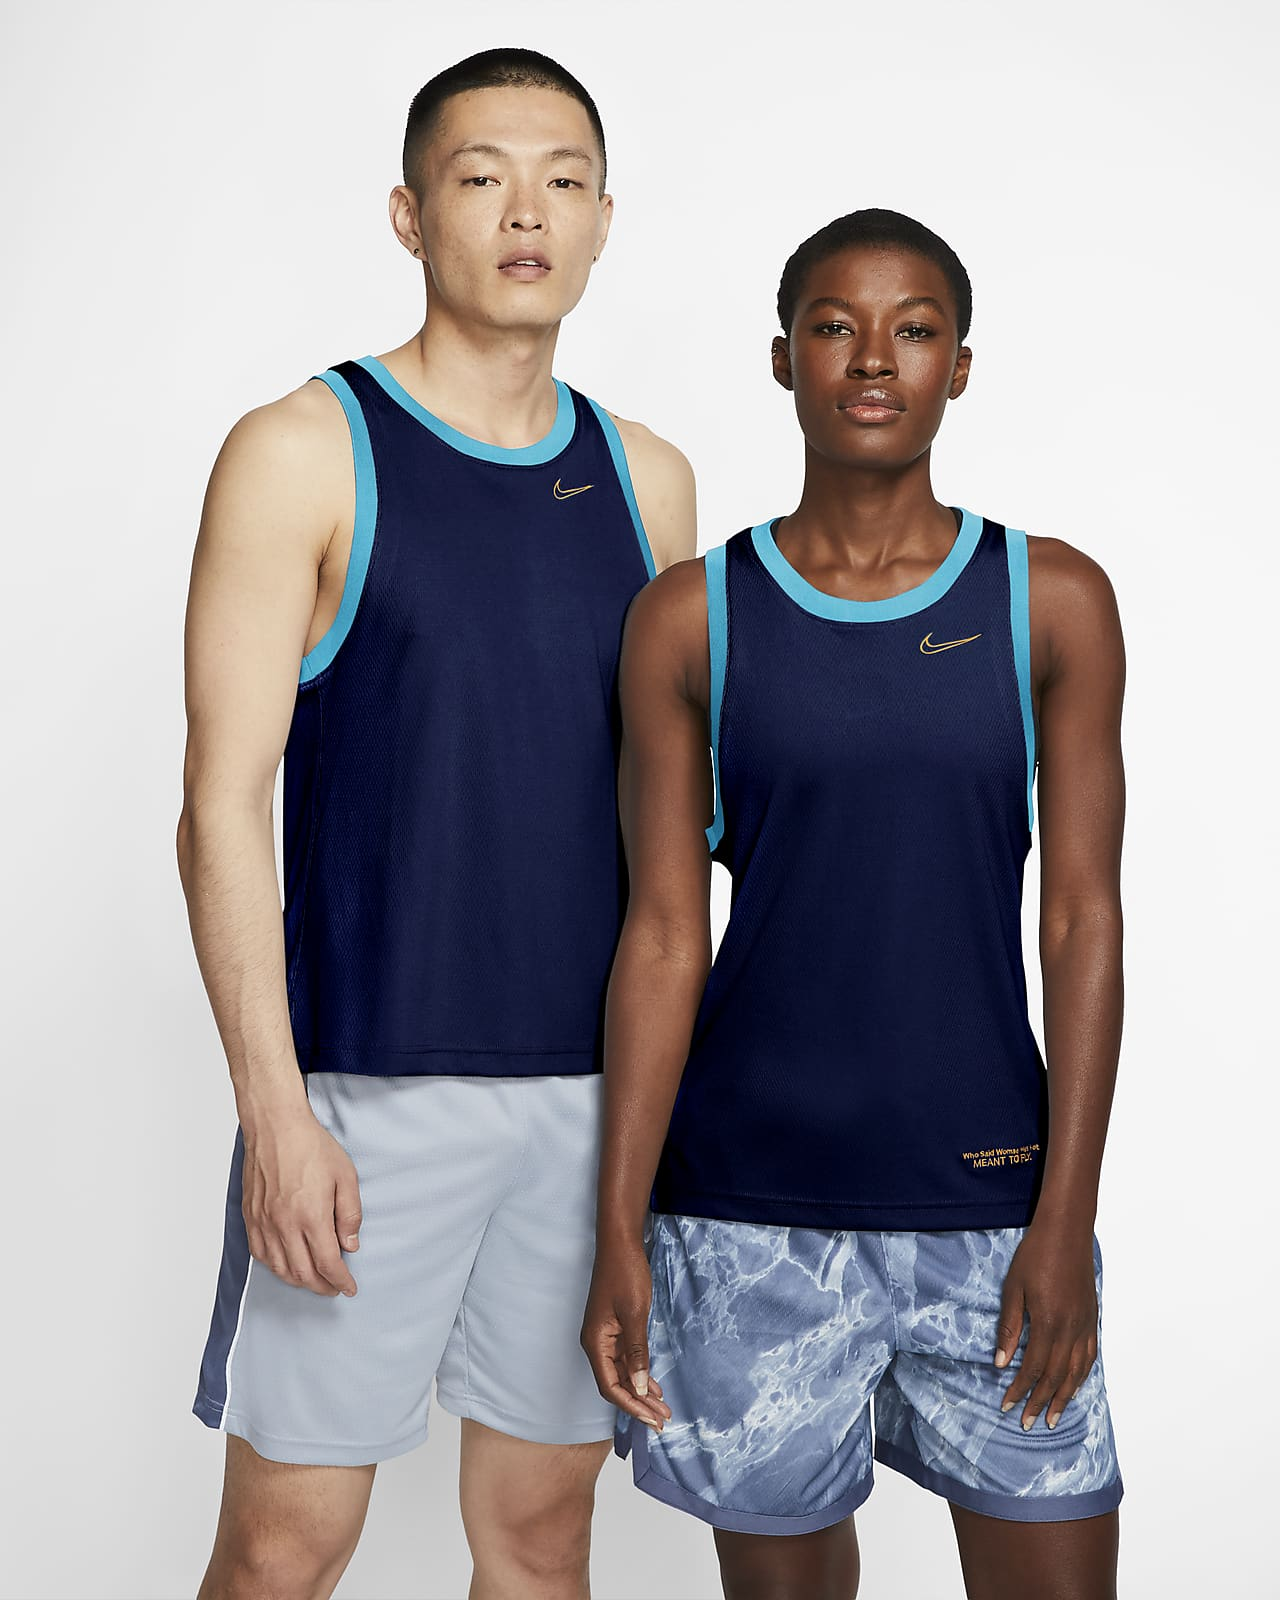 Nike Dri-FIT Sleeveless Basketball Top